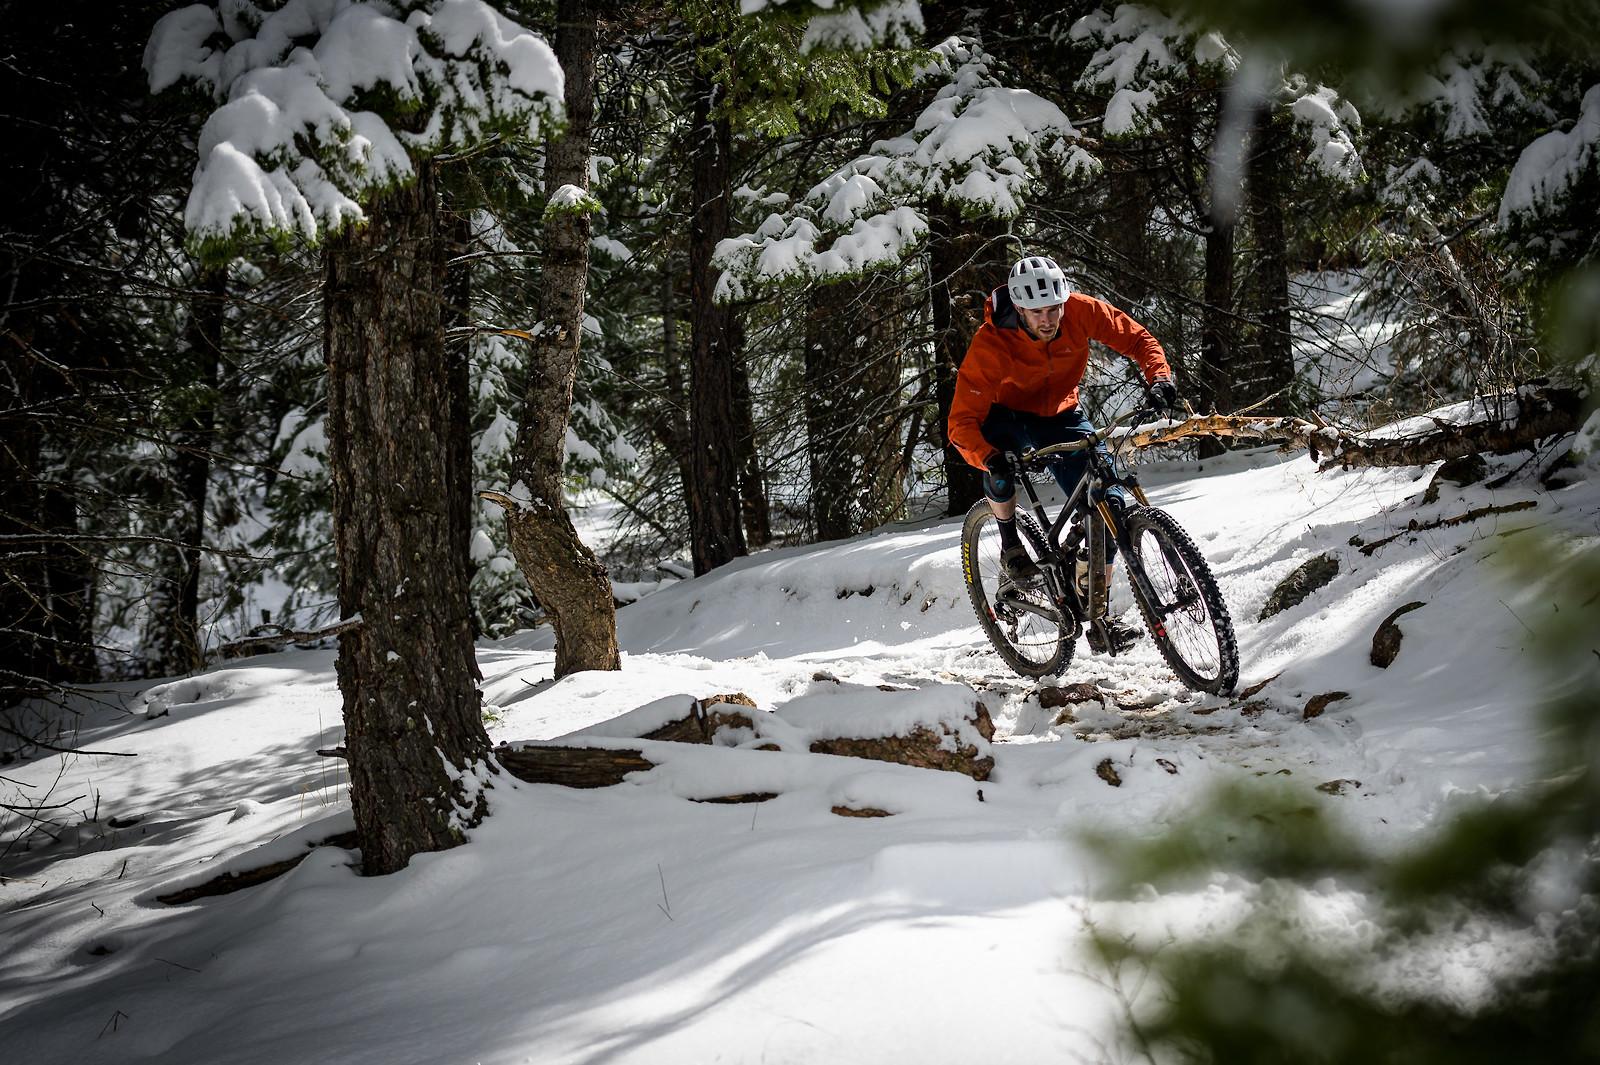 PJR 1868-1 - russellpj - Mountain Biking Pictures - Vital MTB